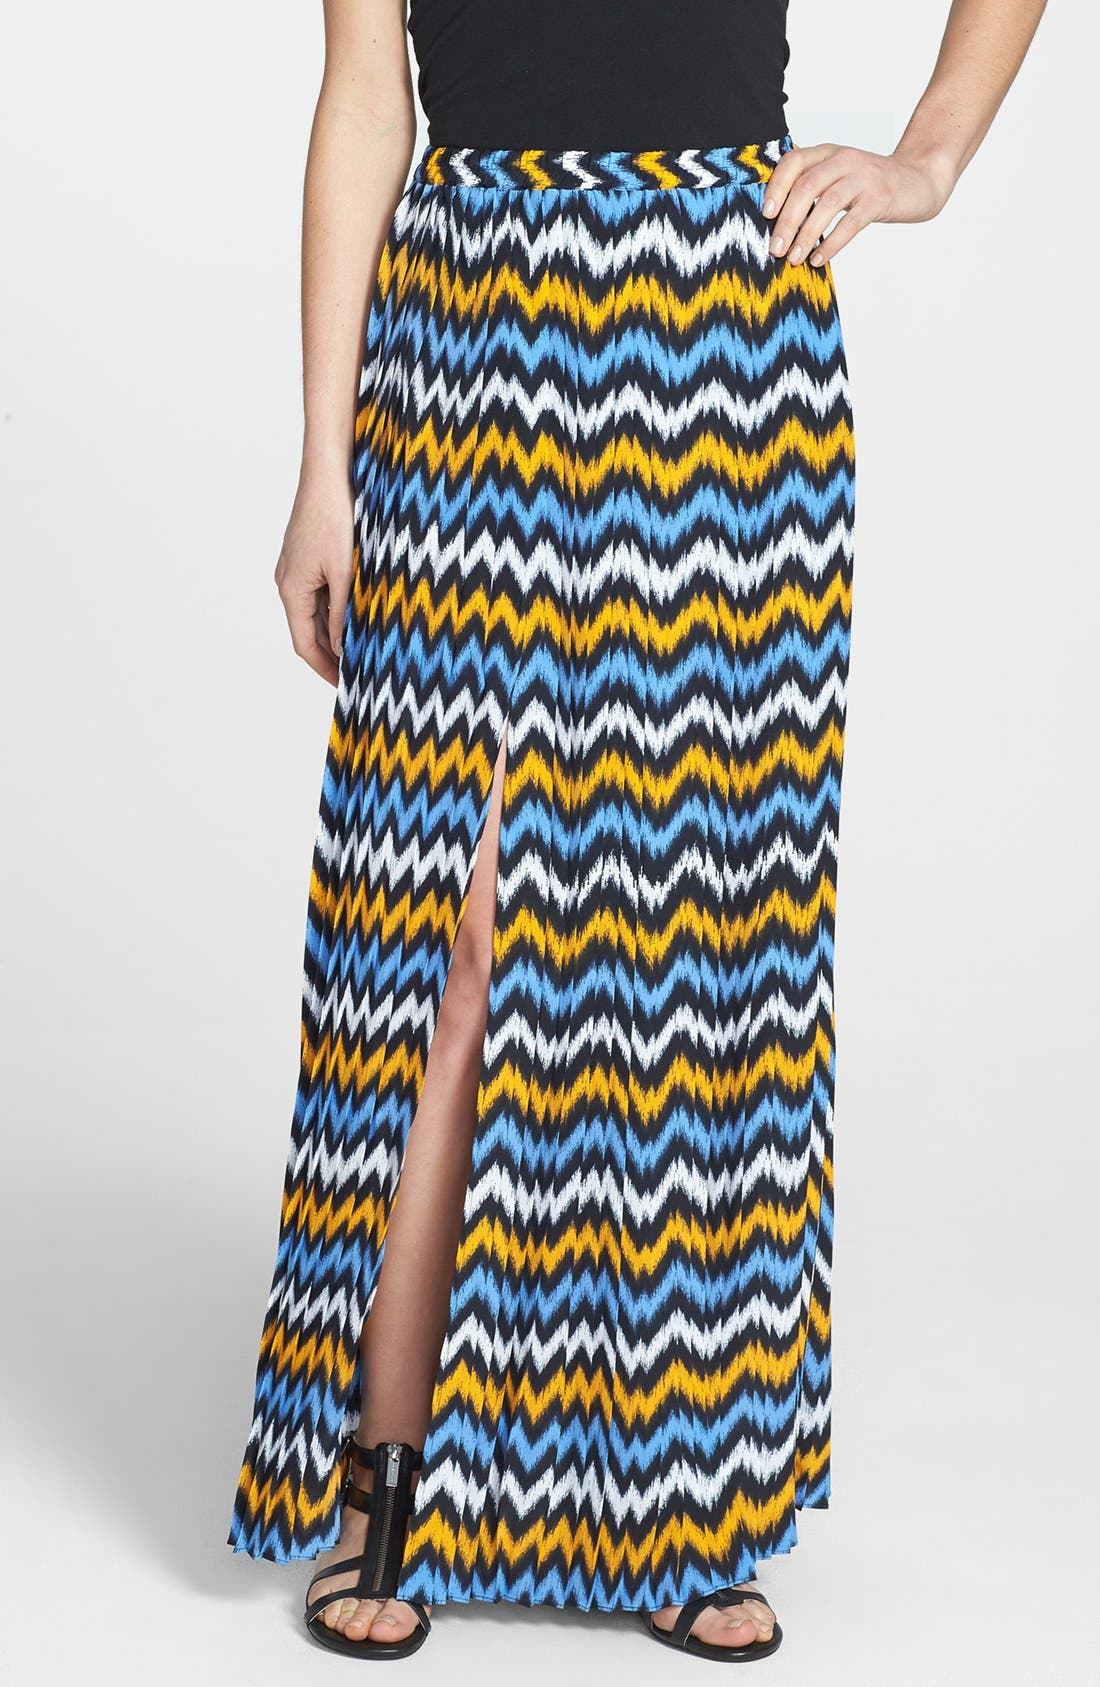 Alternate Image 1 Selected - MICHAEL Michael Kors Ikat Print Pleat Maxi Skirt (Regular & Petite)